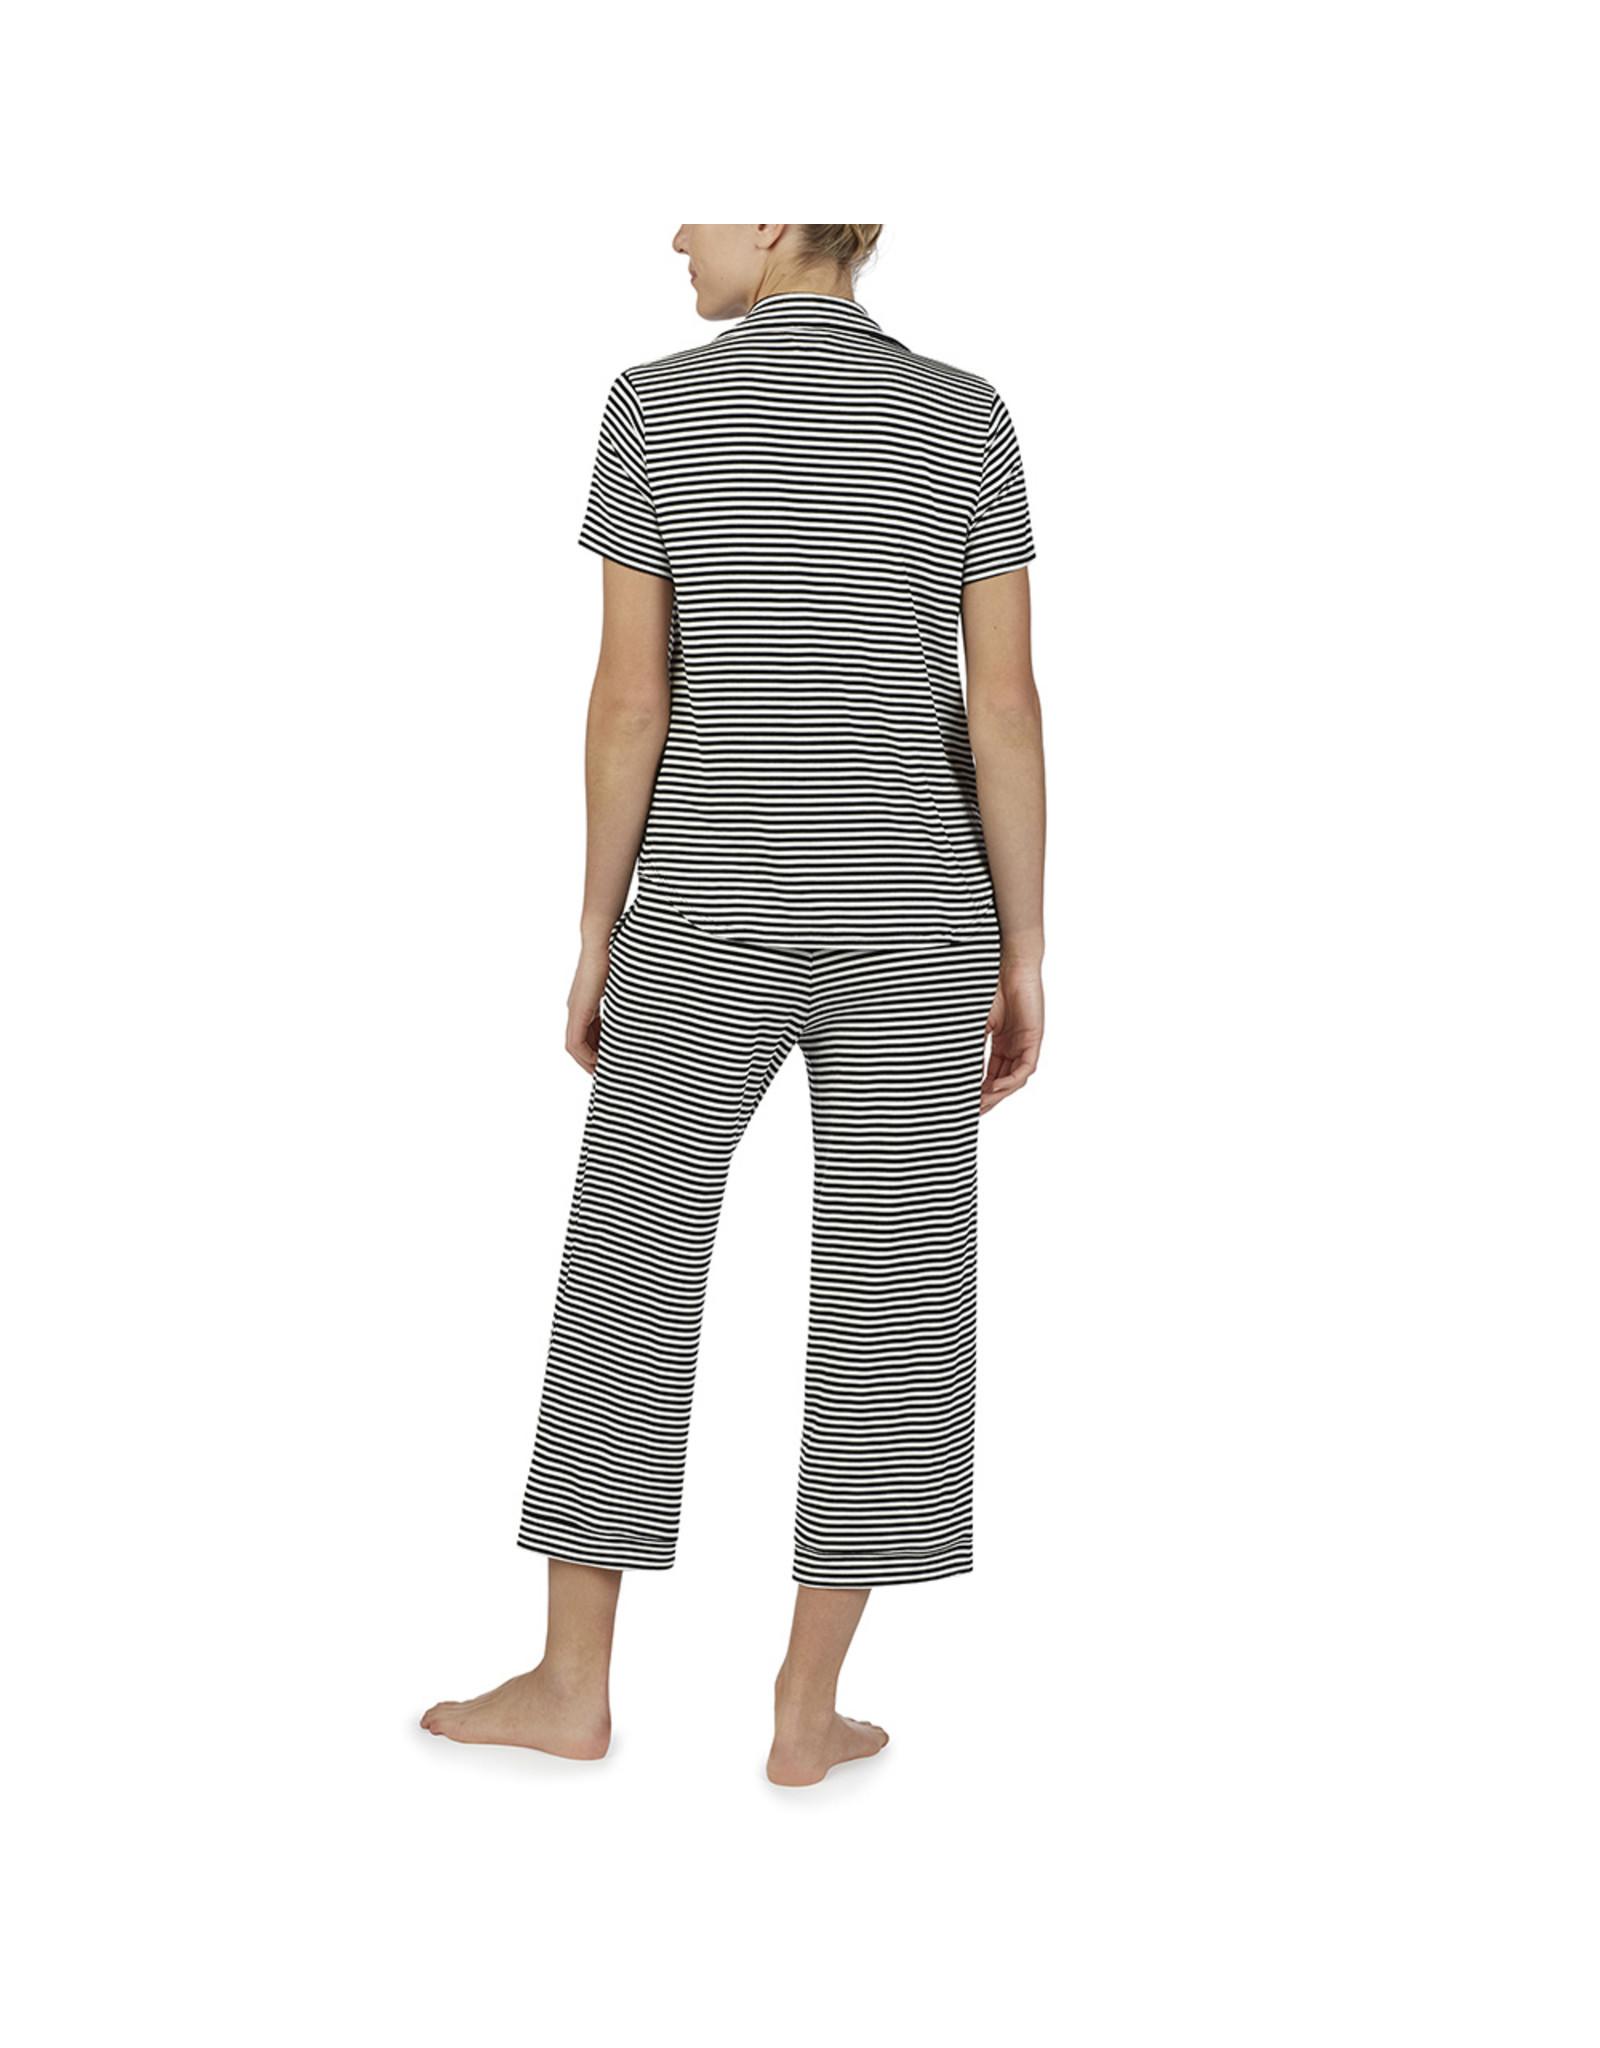 Kate Spade Black & White Stripe Capri Pajama Set